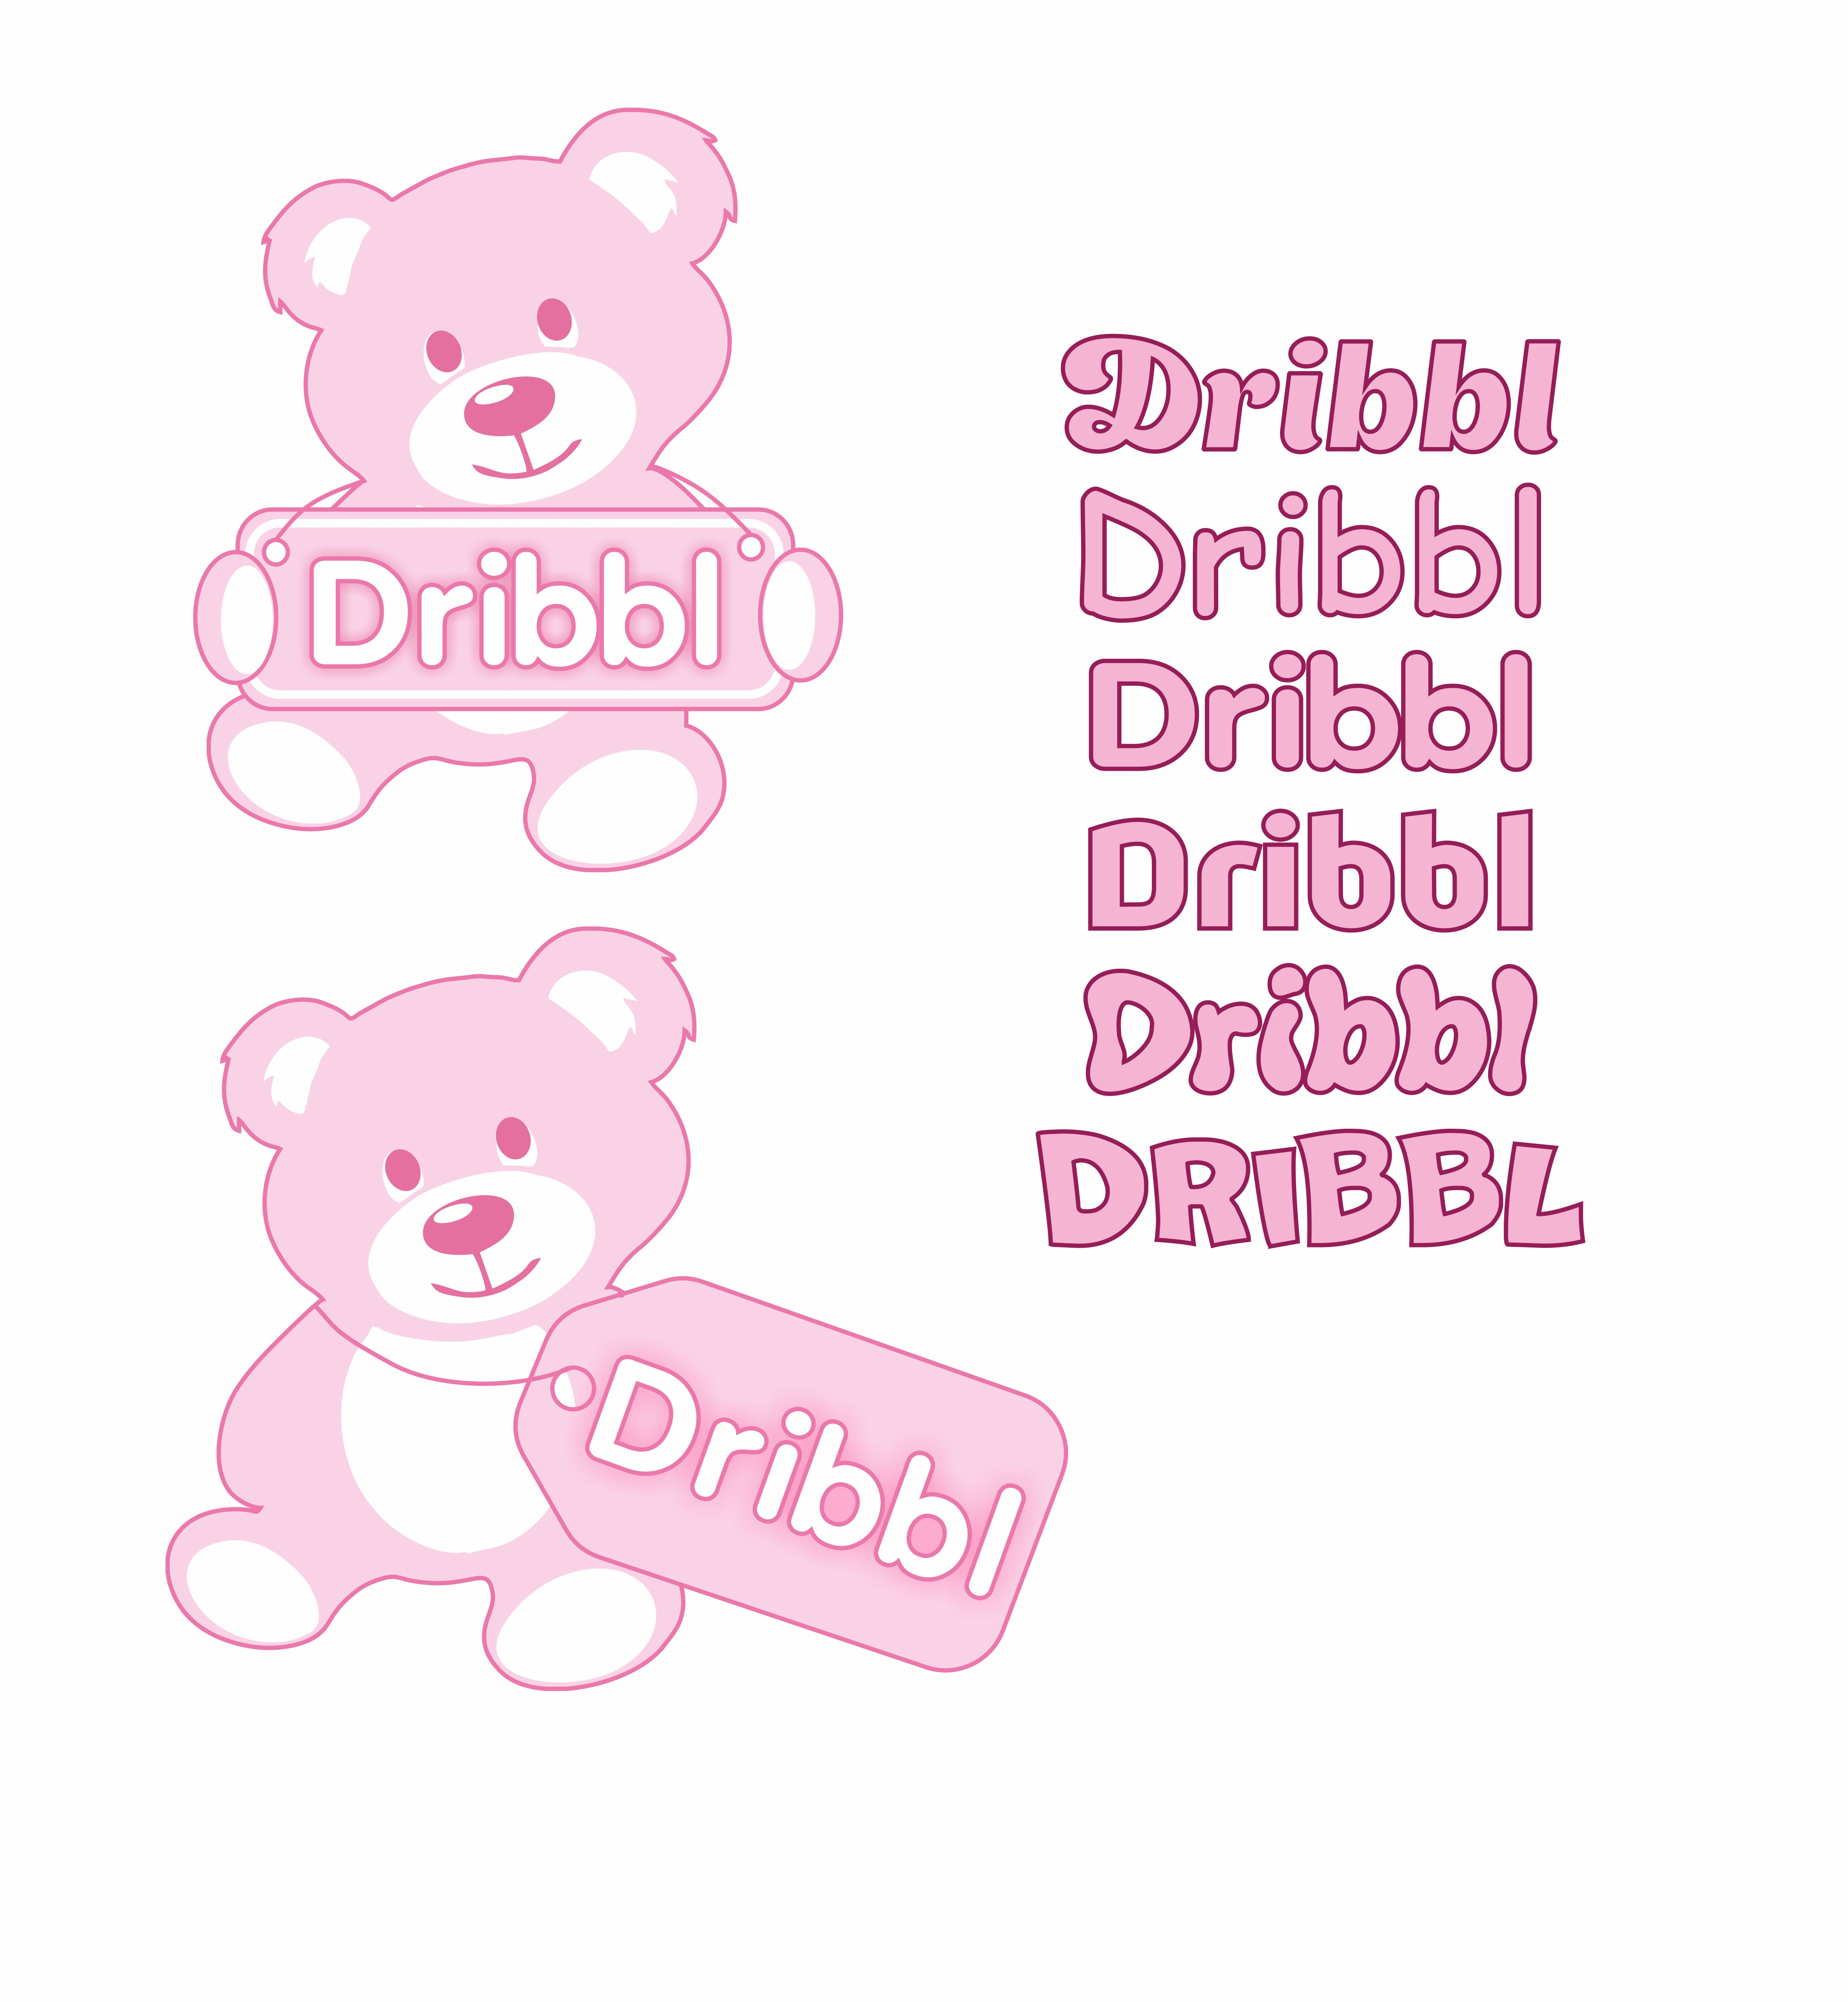 Разработка логотипа для сайта Dribbl.ru фото f_2125a9bc791f403f.jpg